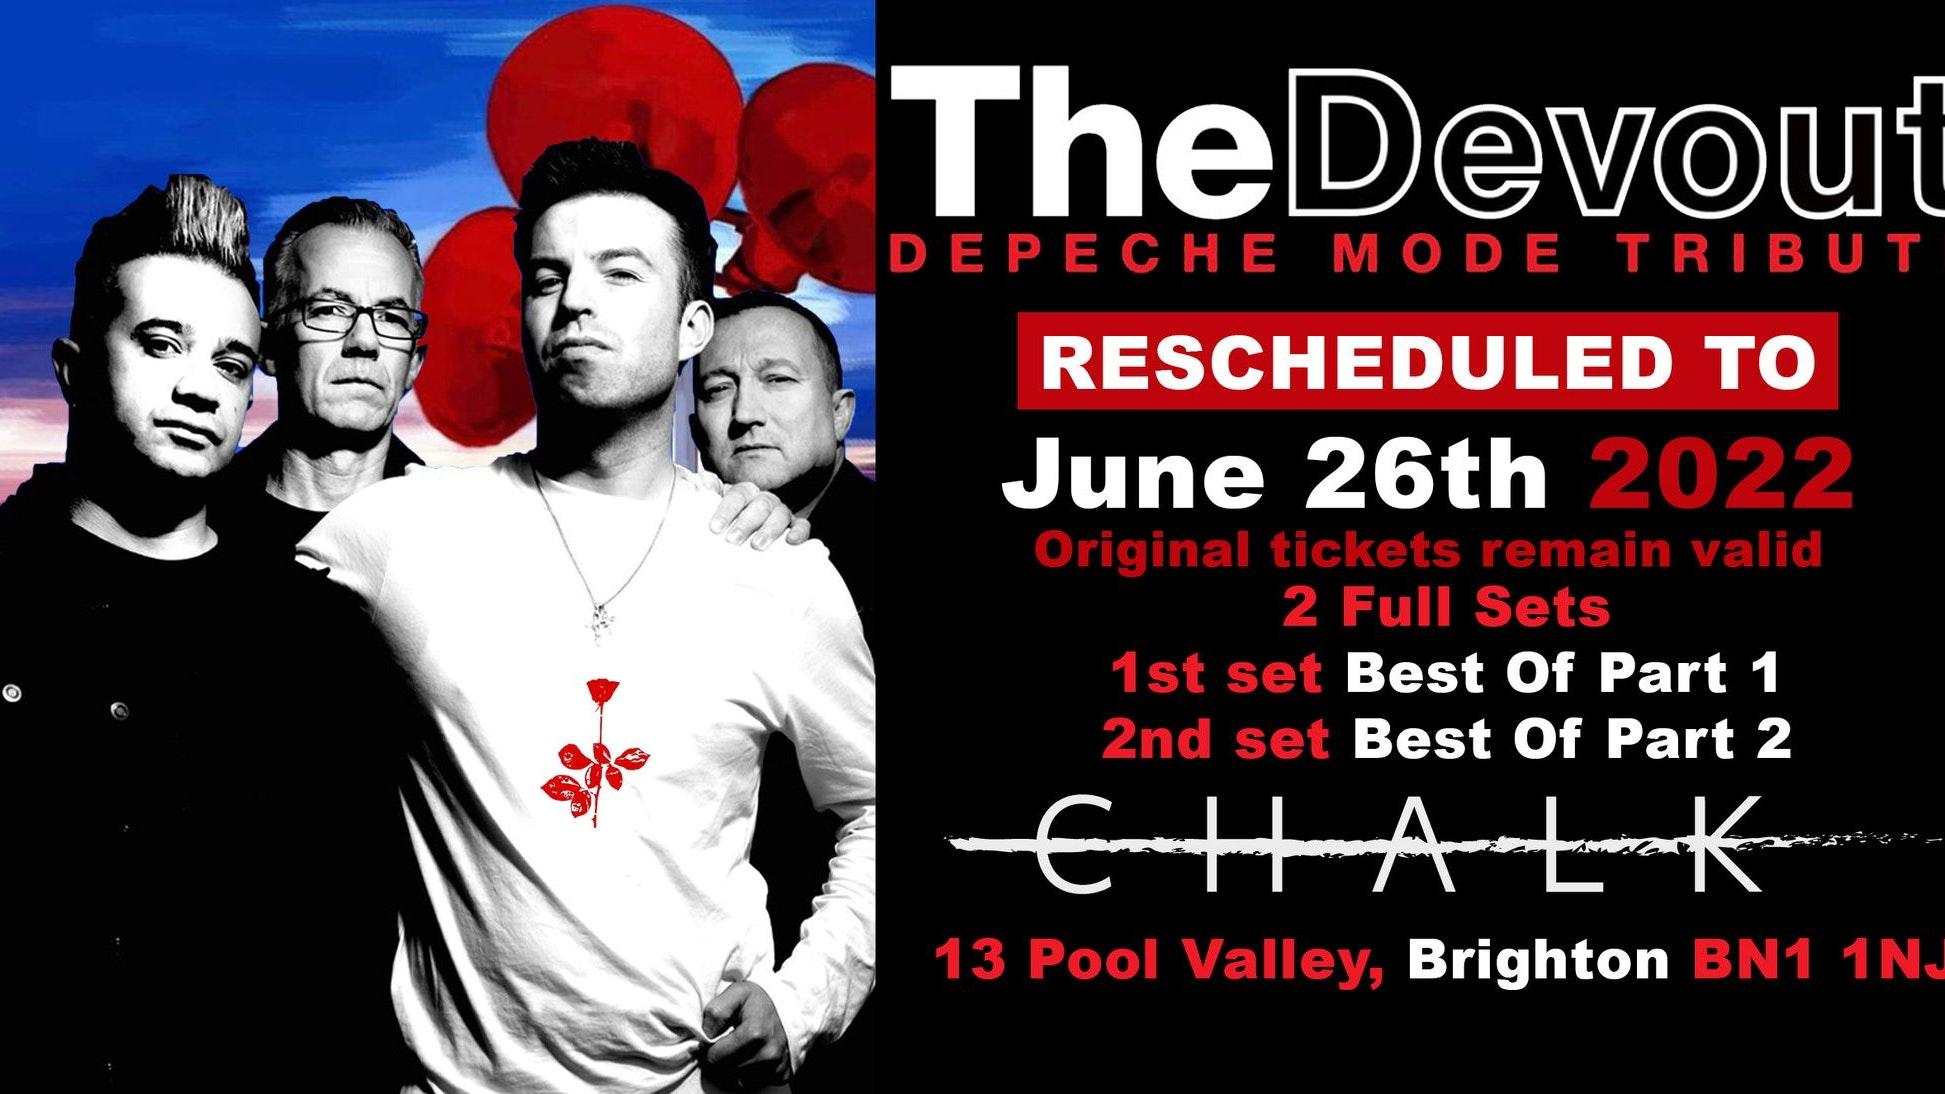 The Devout – Depeche Mode Tribute at The Chalk